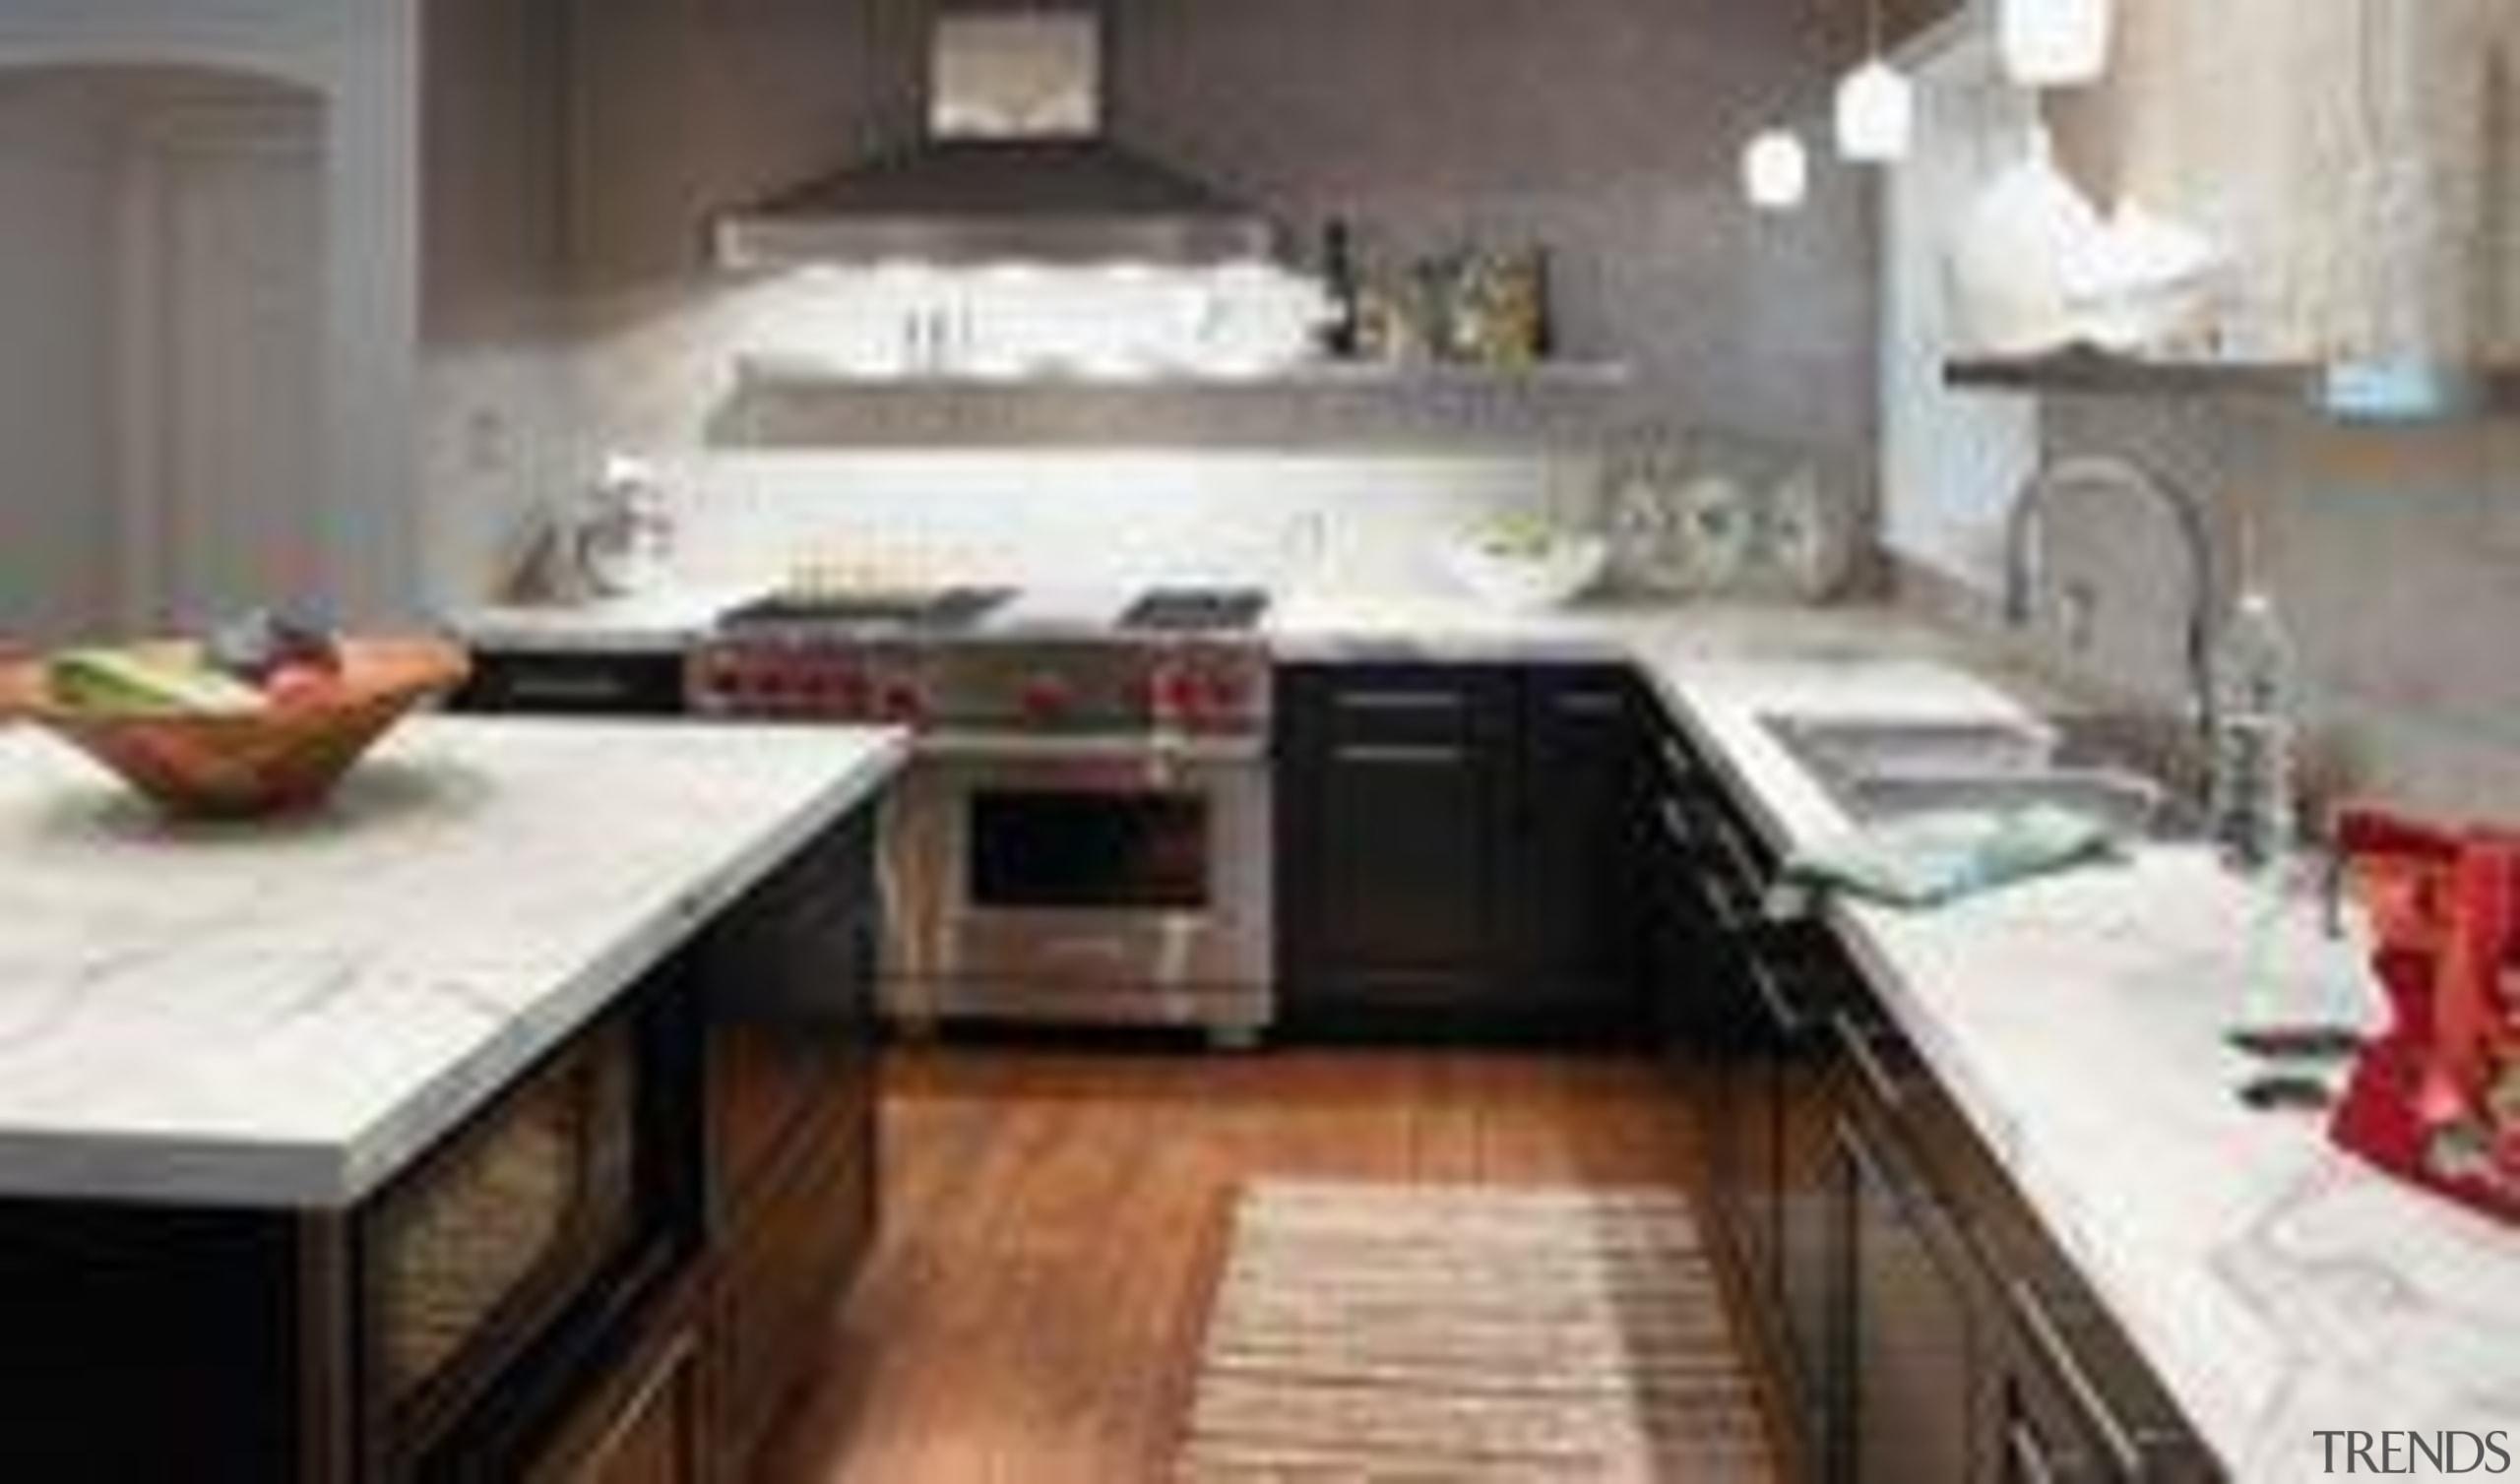 My Dream Kitchen : Inspiration Gallery : Country countertop, cuisine classique, floor, flooring, interior design, kitchen, property, room, gray, white